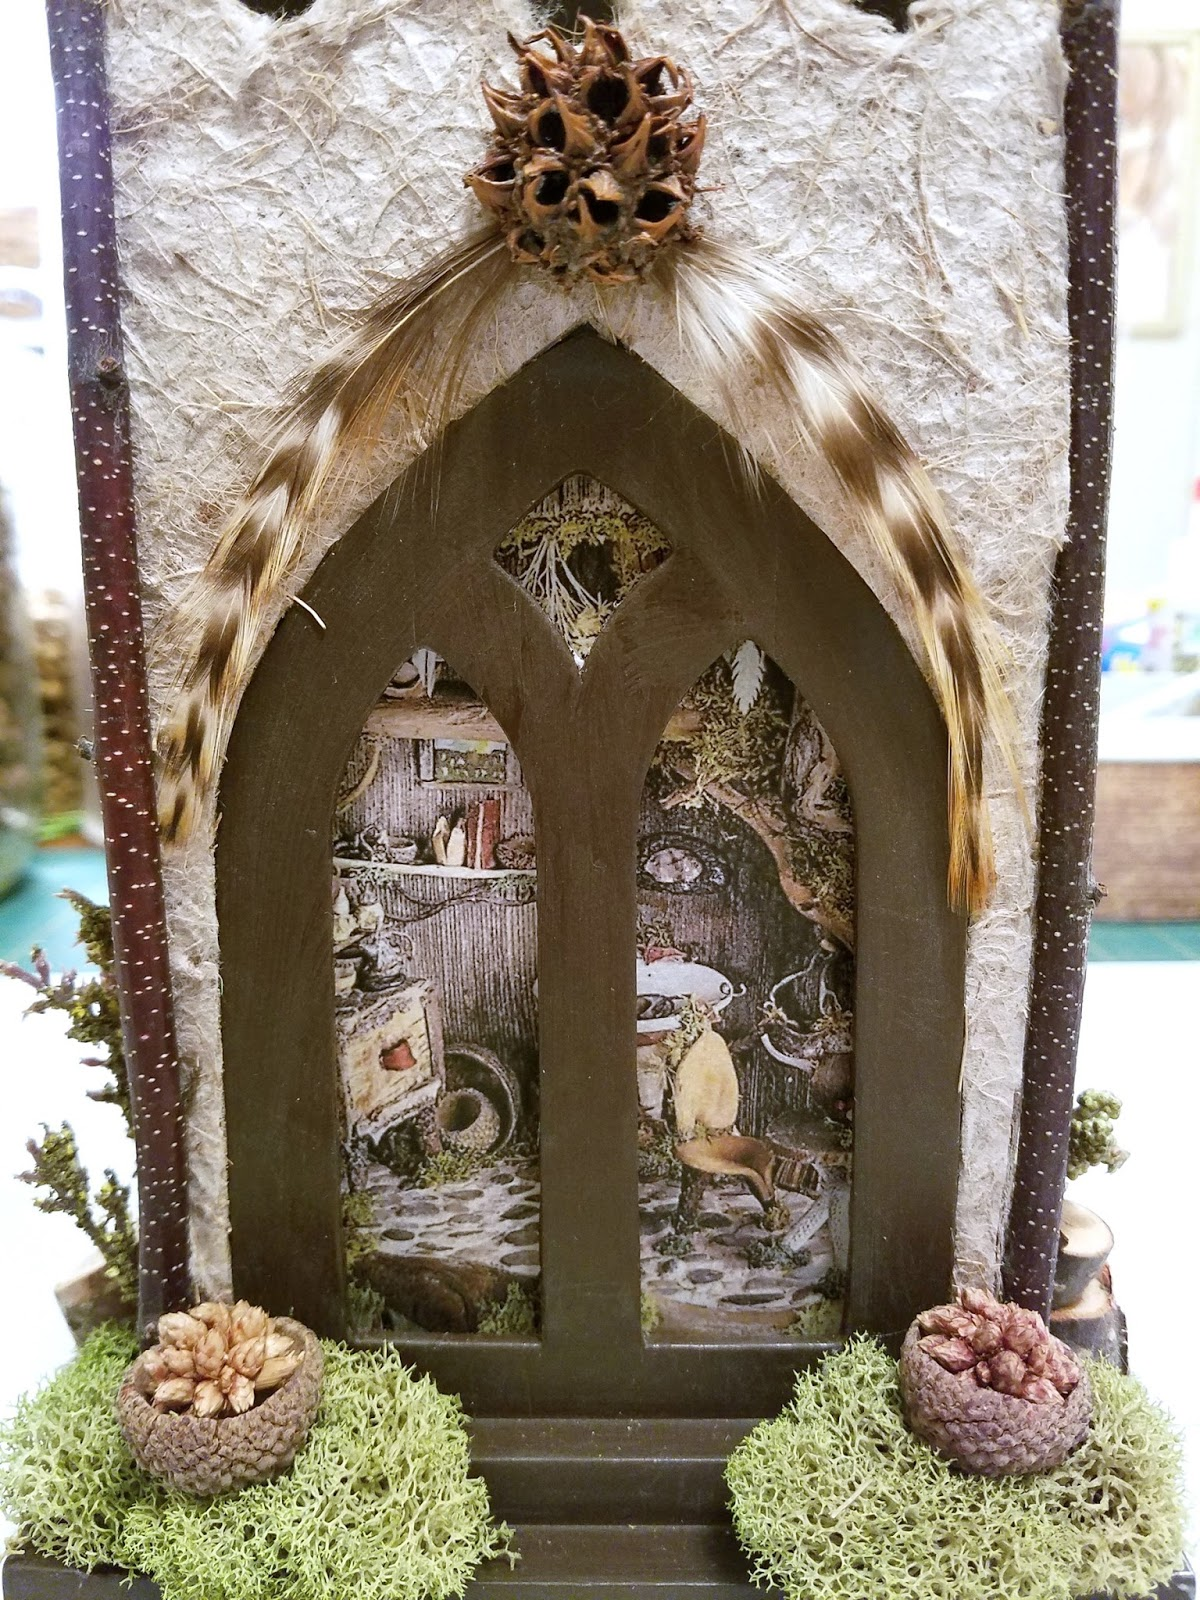 The Feathered Nest A Whimsical Fairy House